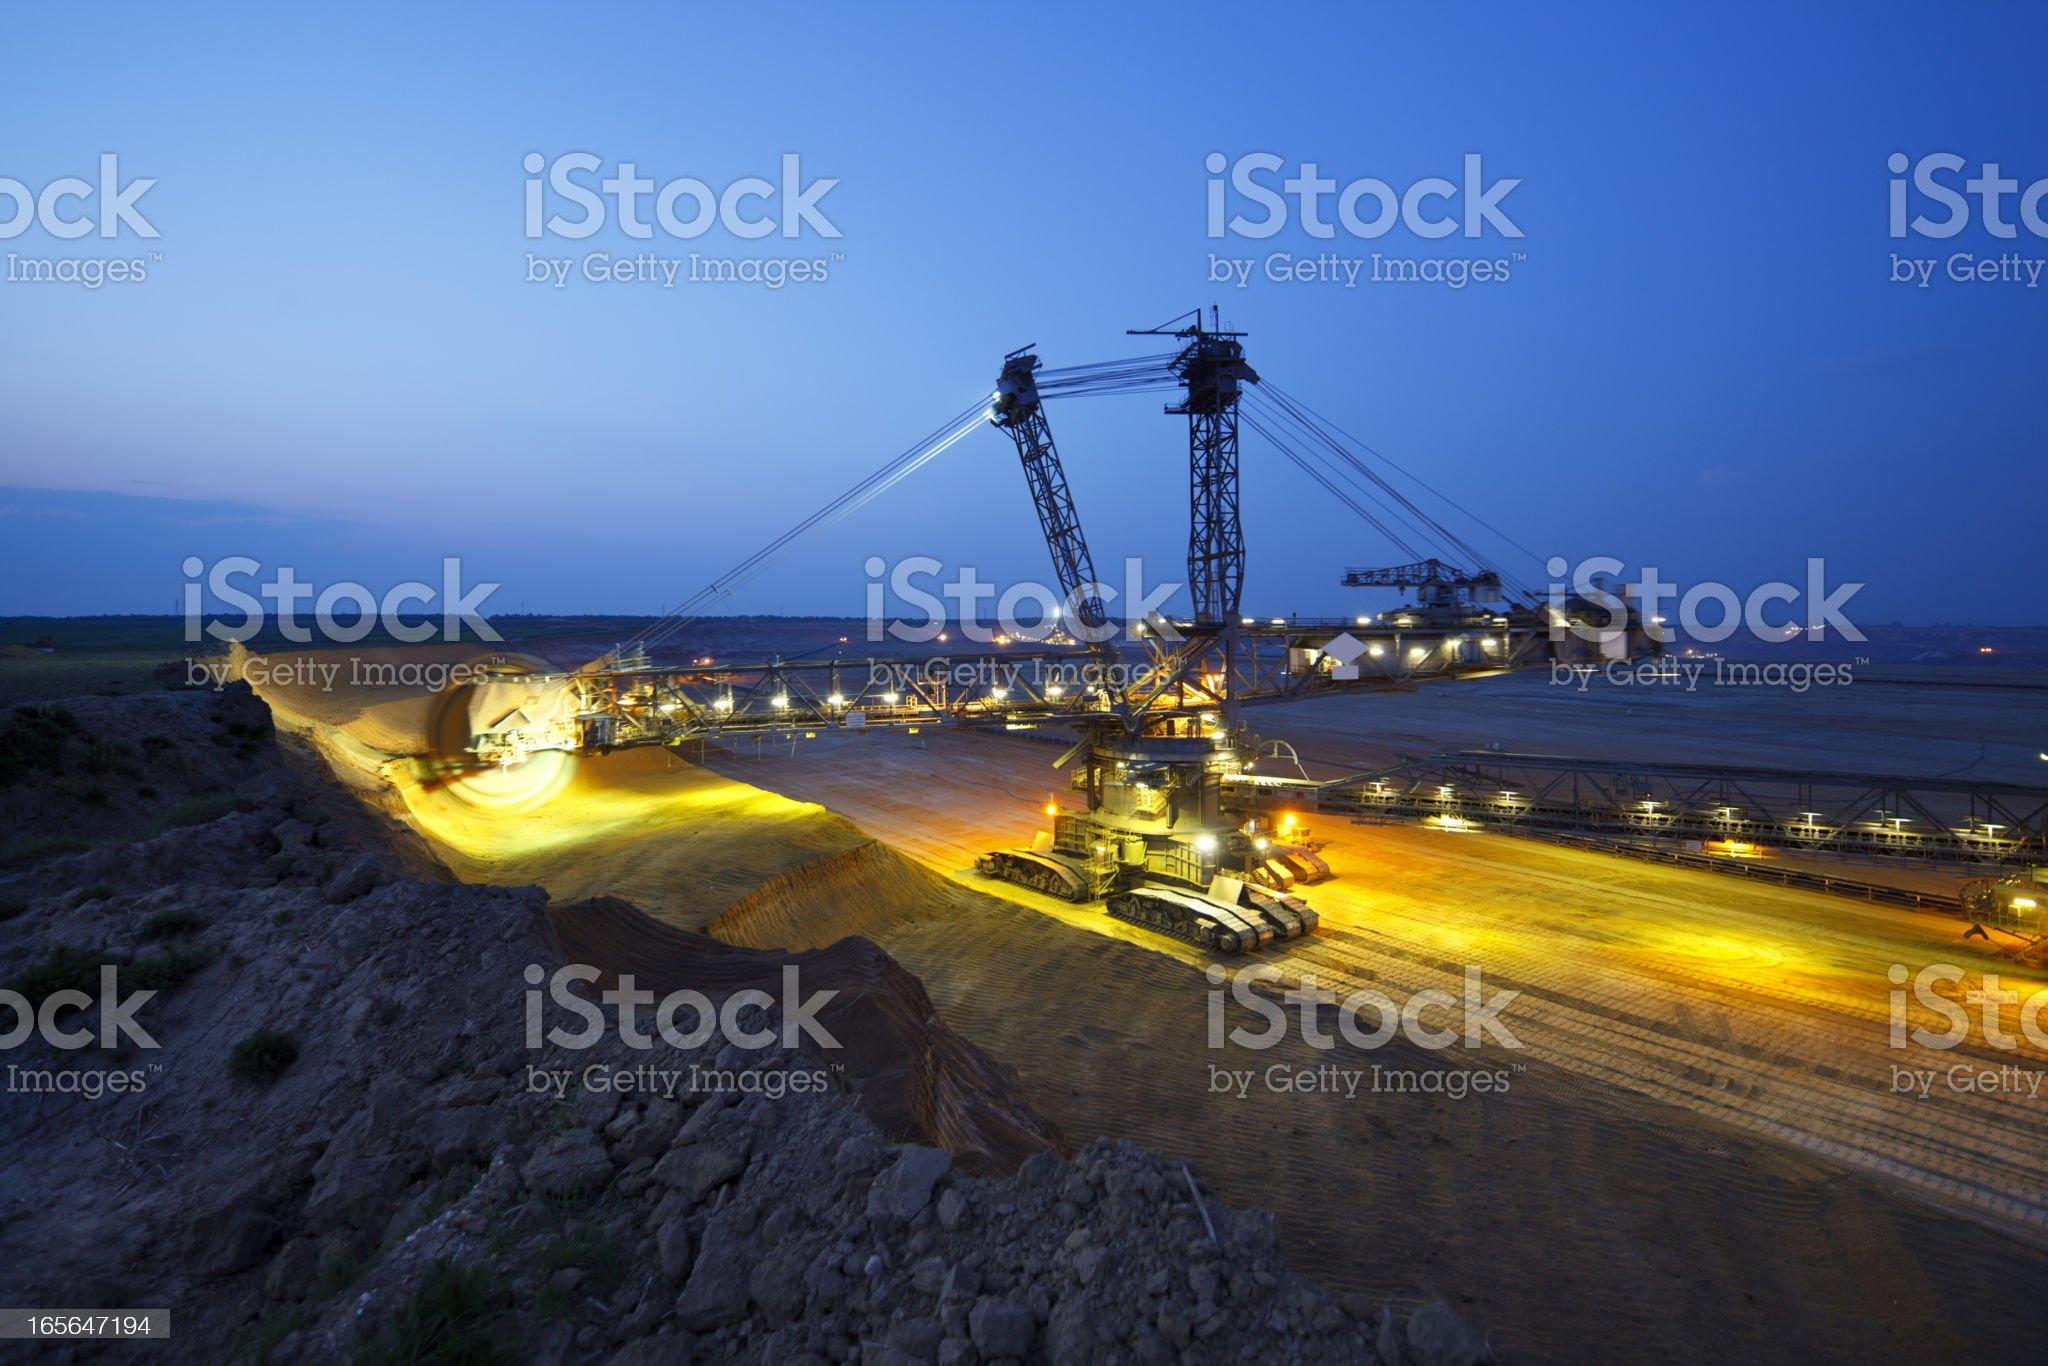 Giant Bucket-Wheel Excavator At Work royalty-free stock photo